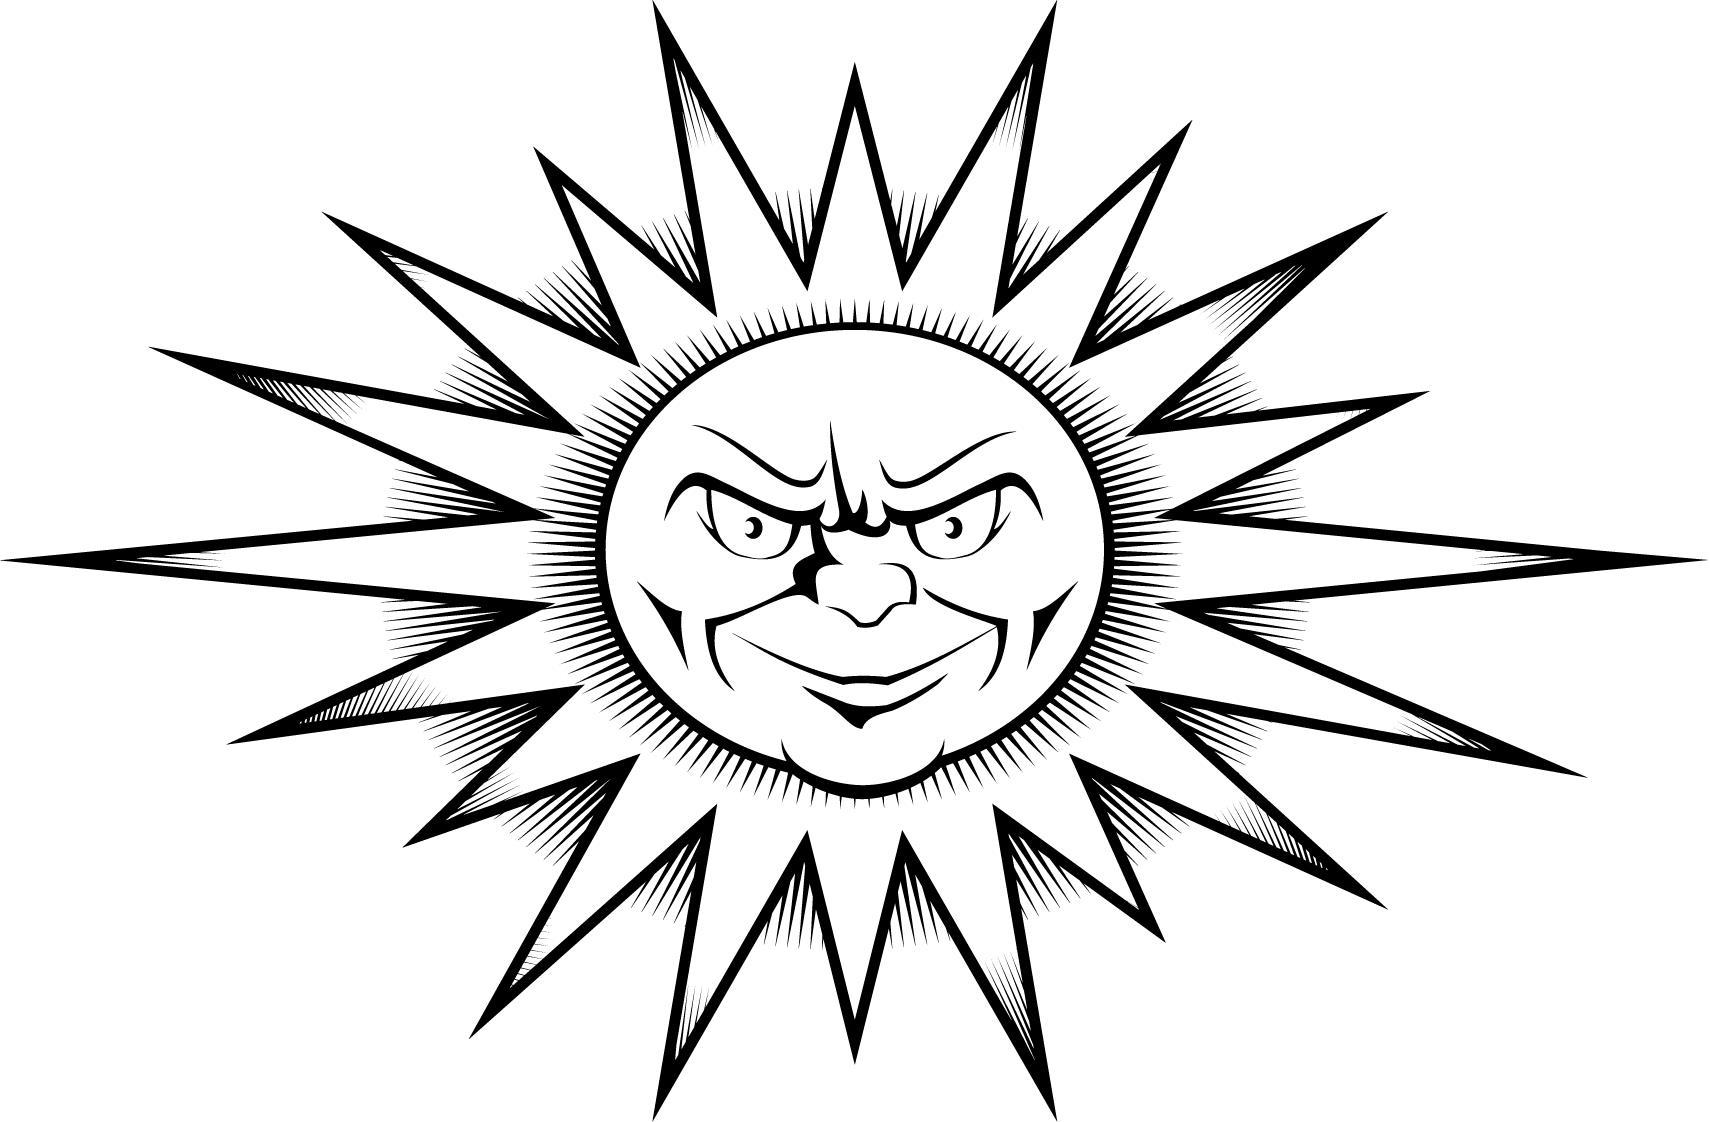 Worksheet Of A Sun Tattoo Design Printable